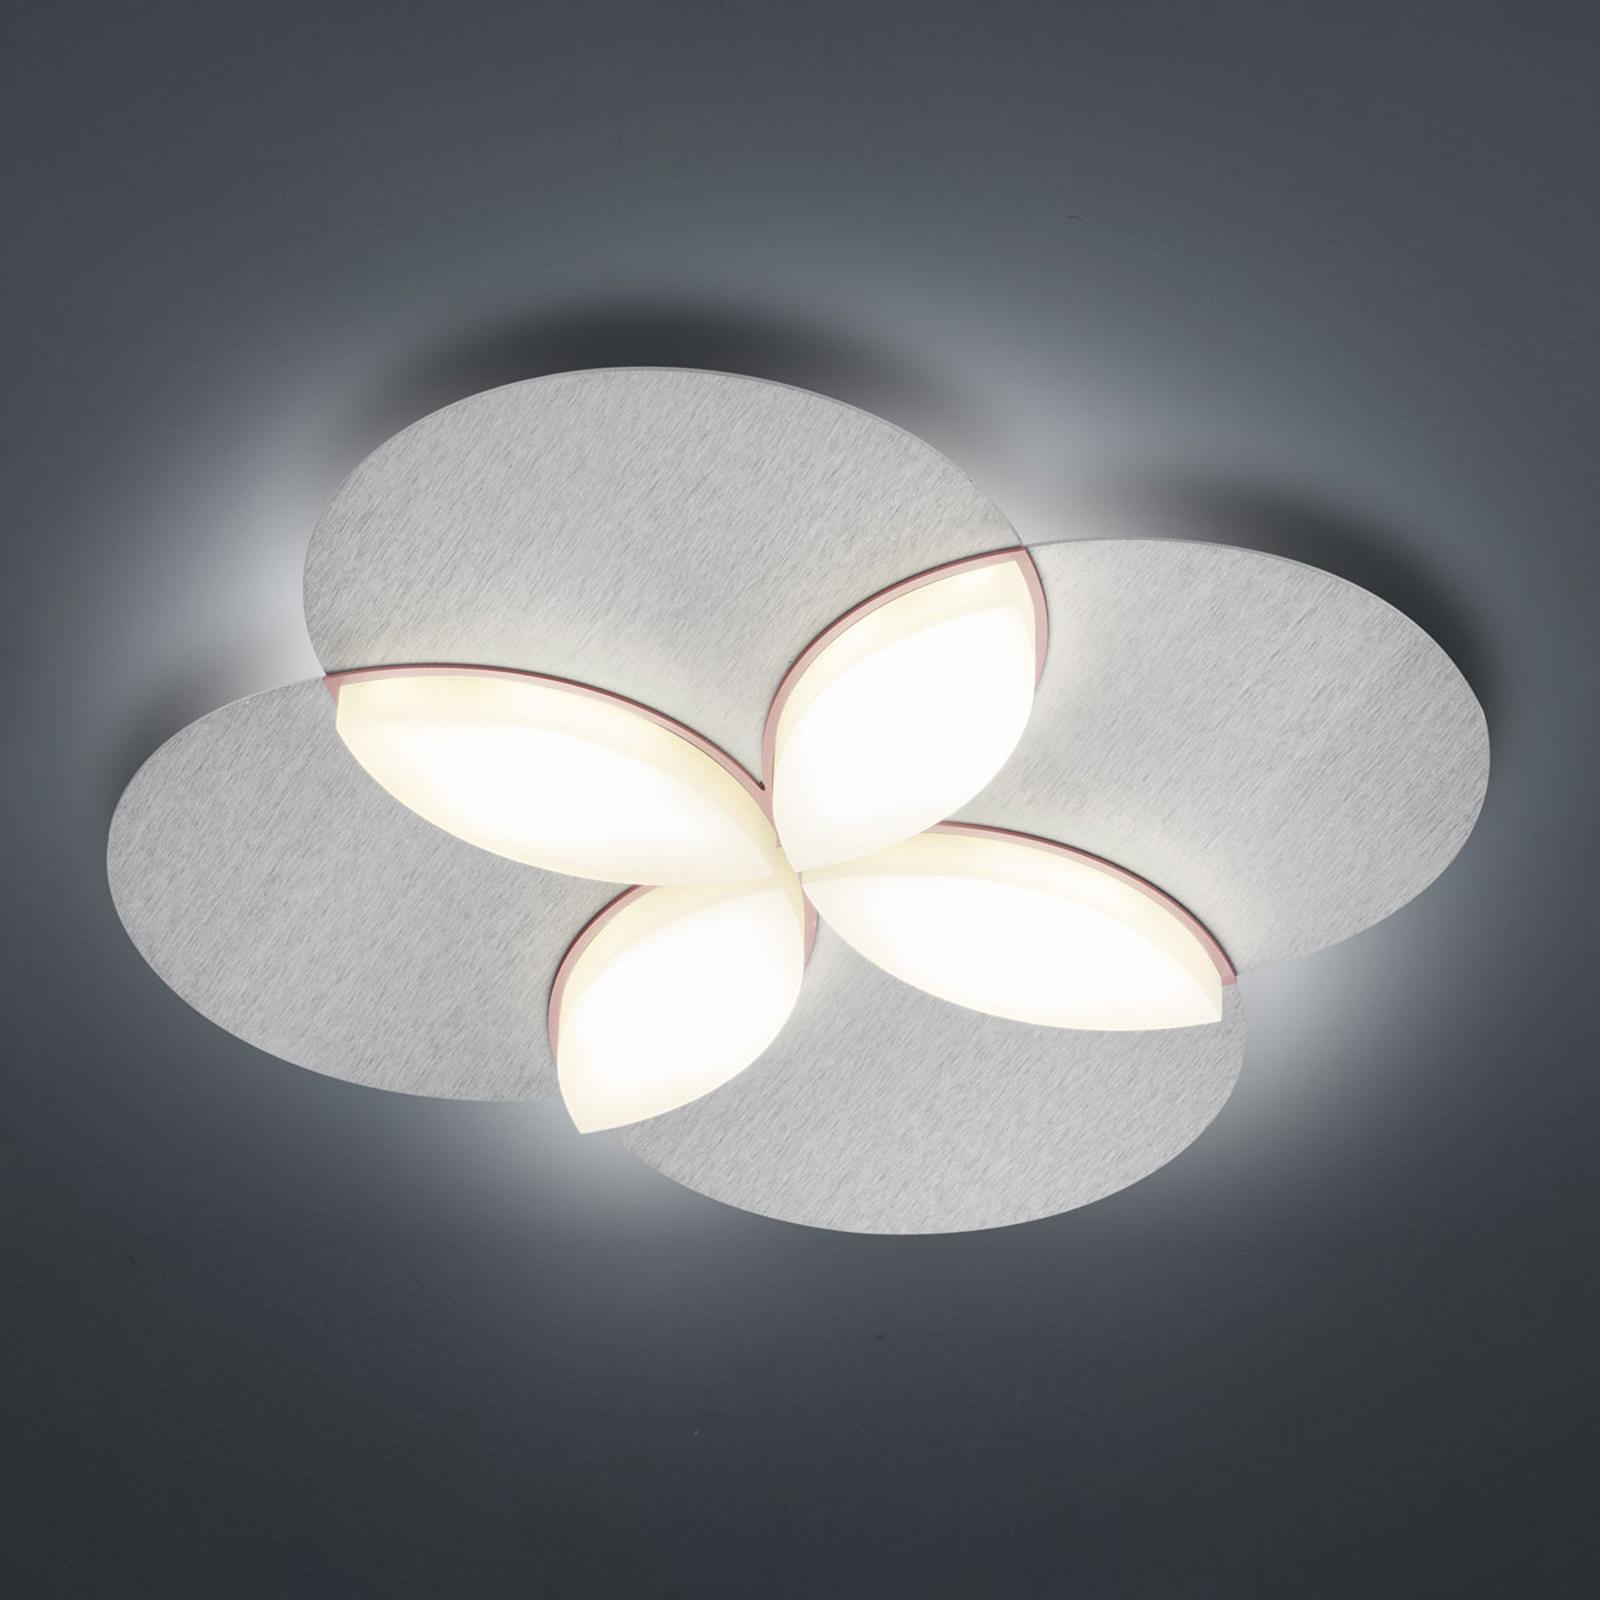 BANKAMP Spring lampa sufitowa LED, srebrna